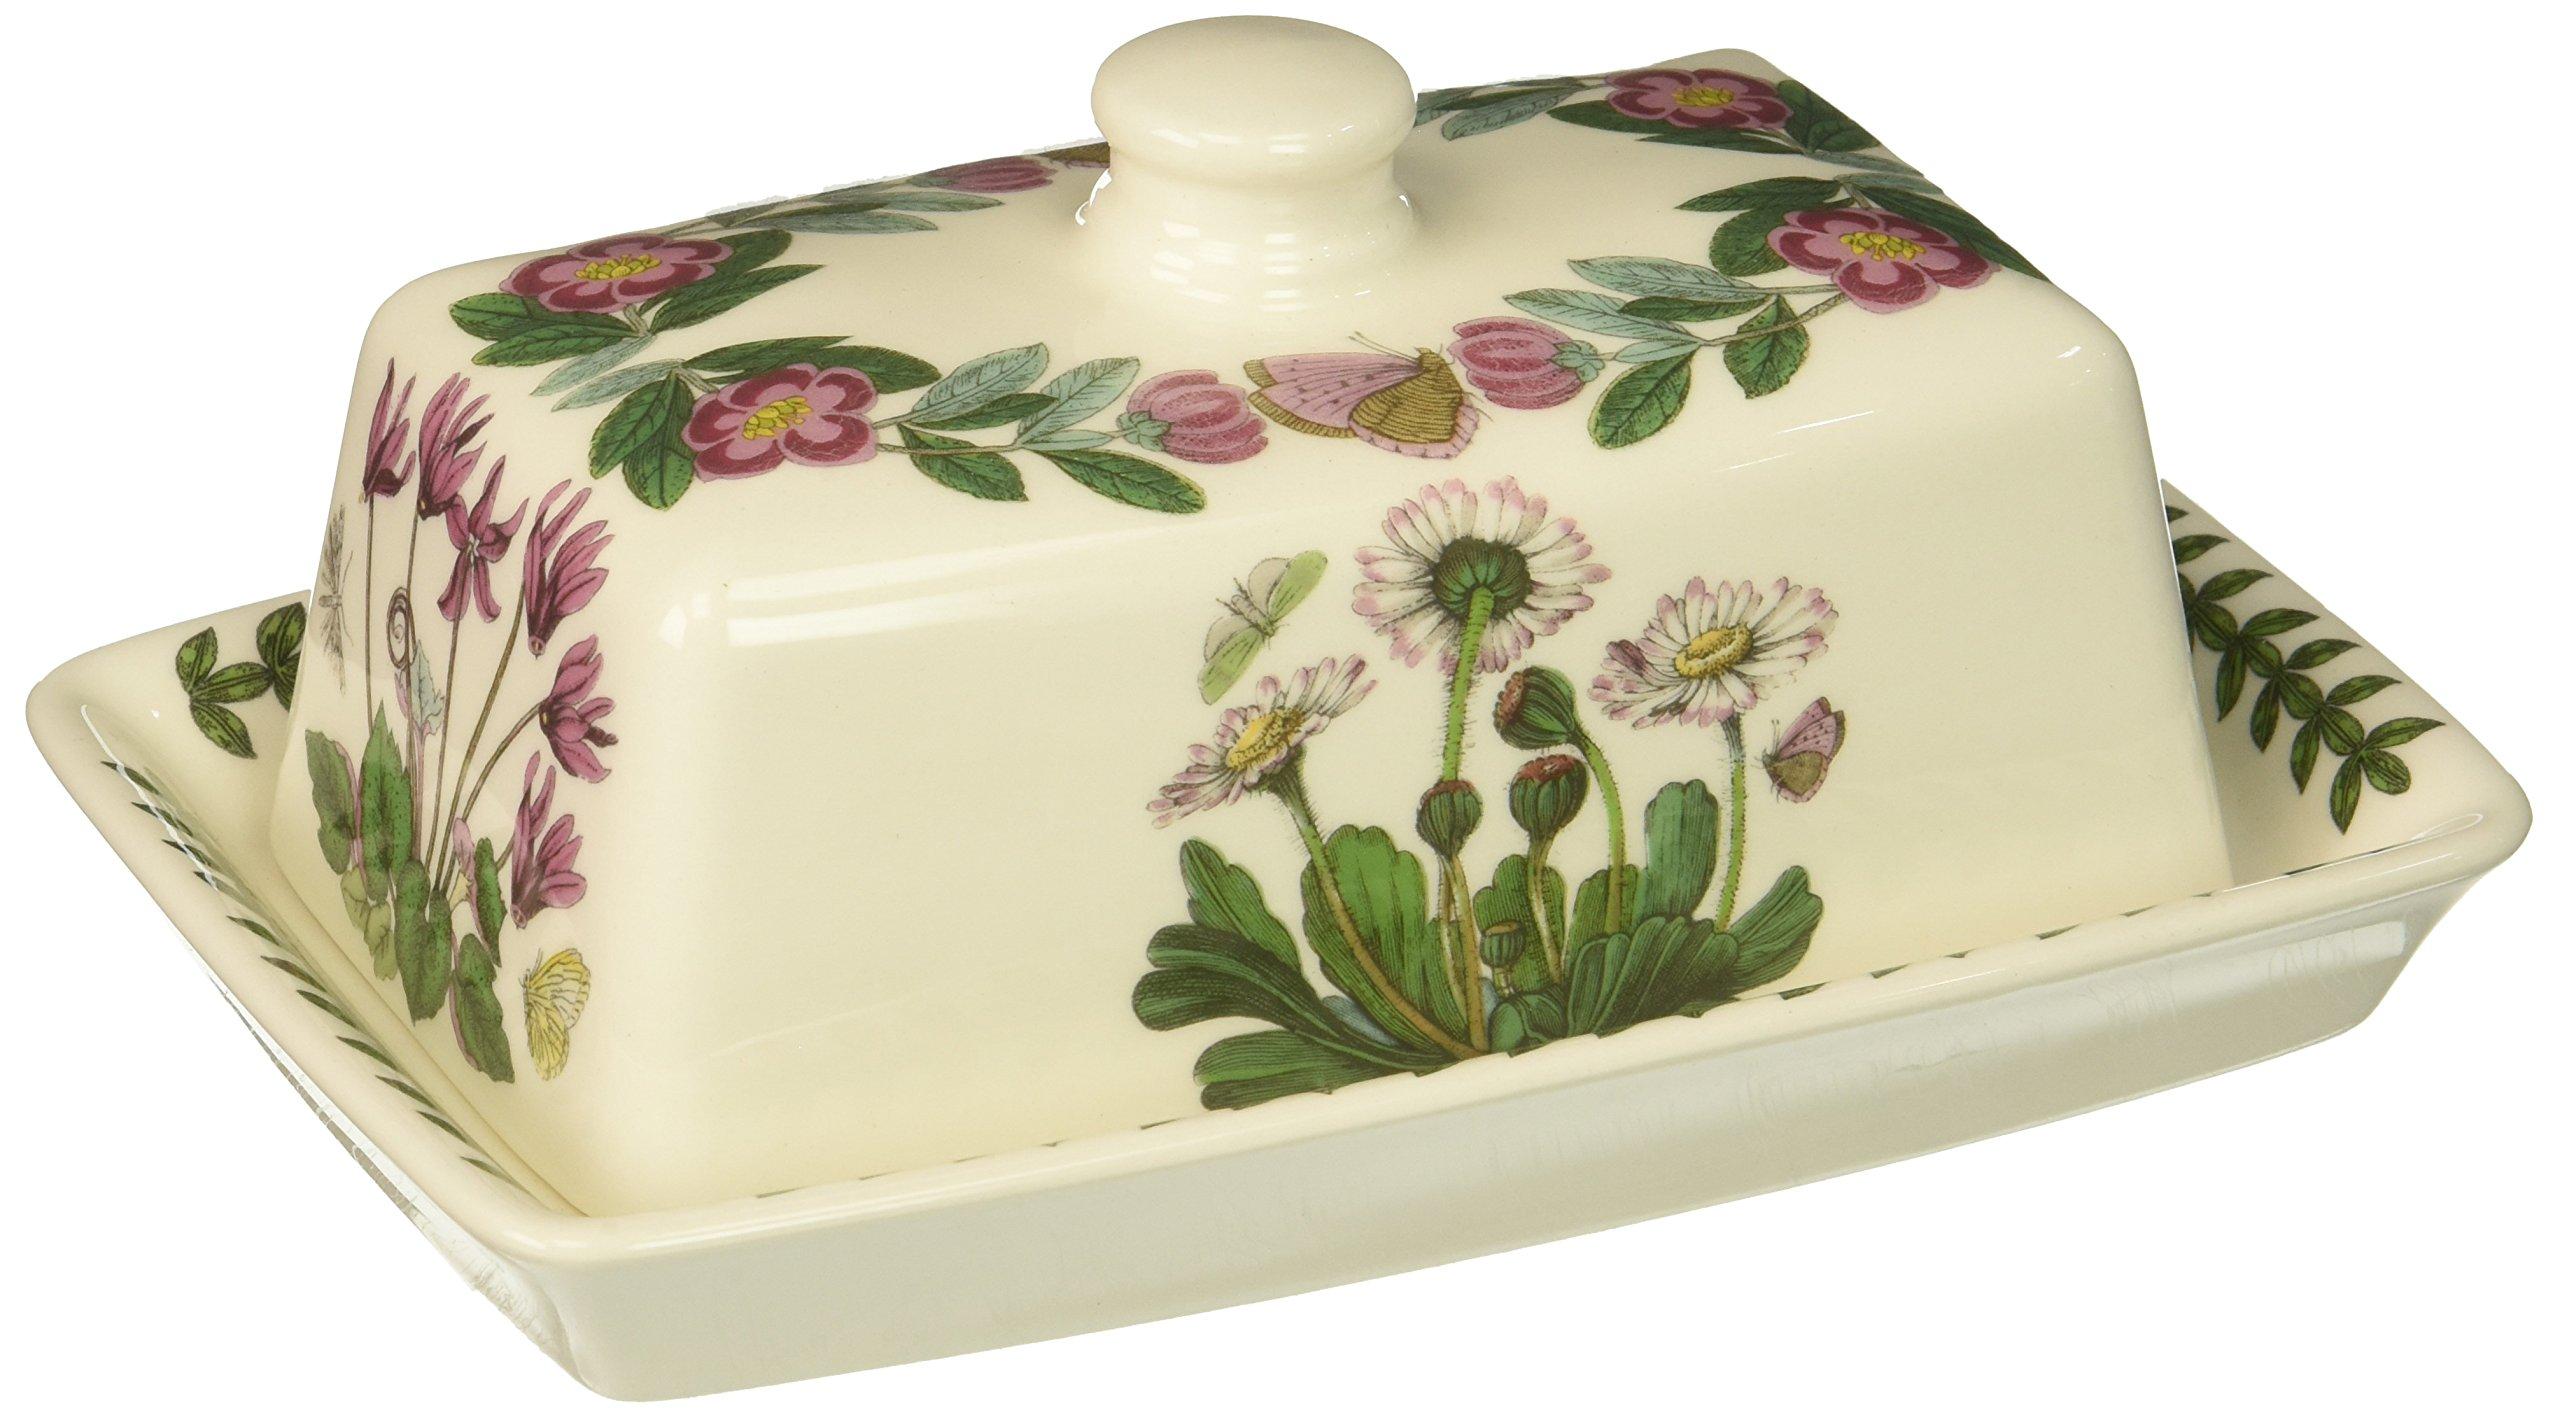 Portmeirion Botanic Garden Covered Butter Dish by Portmeirion (Image #1)